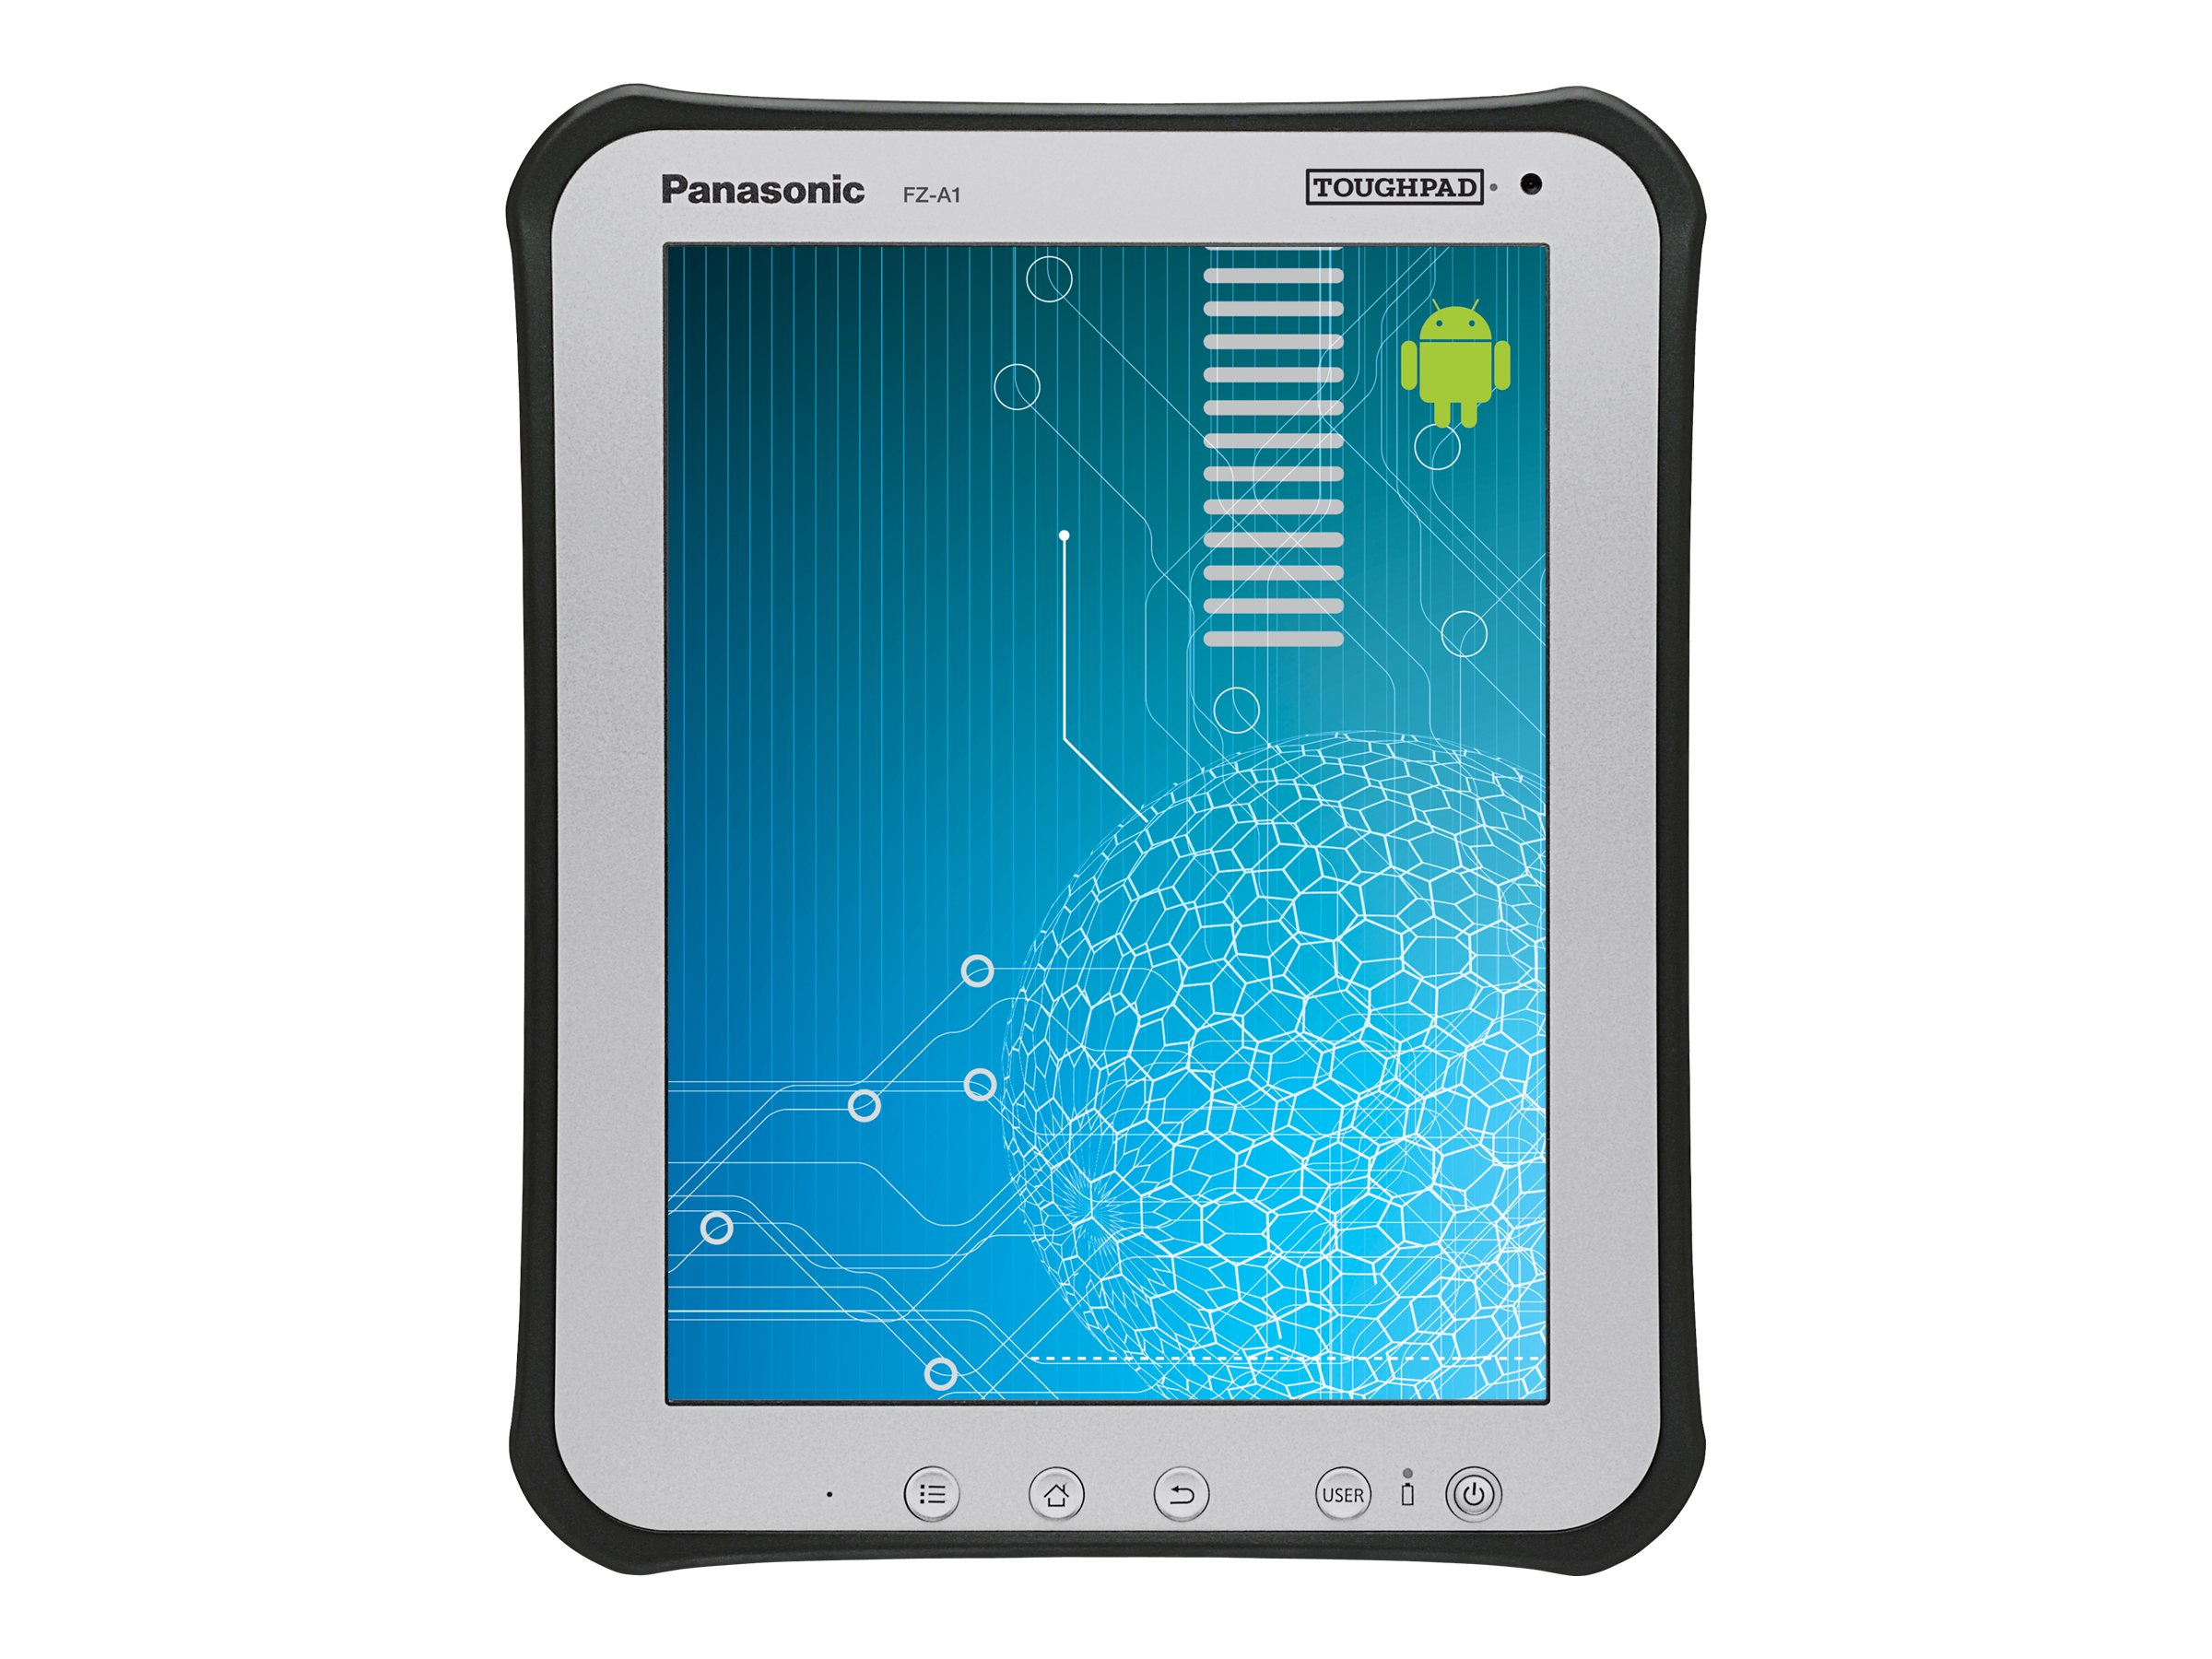 Panasonic Toughpad FZ-A1 Marvell ARM PXA2128 1.2GHz 10.1 XGA MT+Digitizer Android 4.0